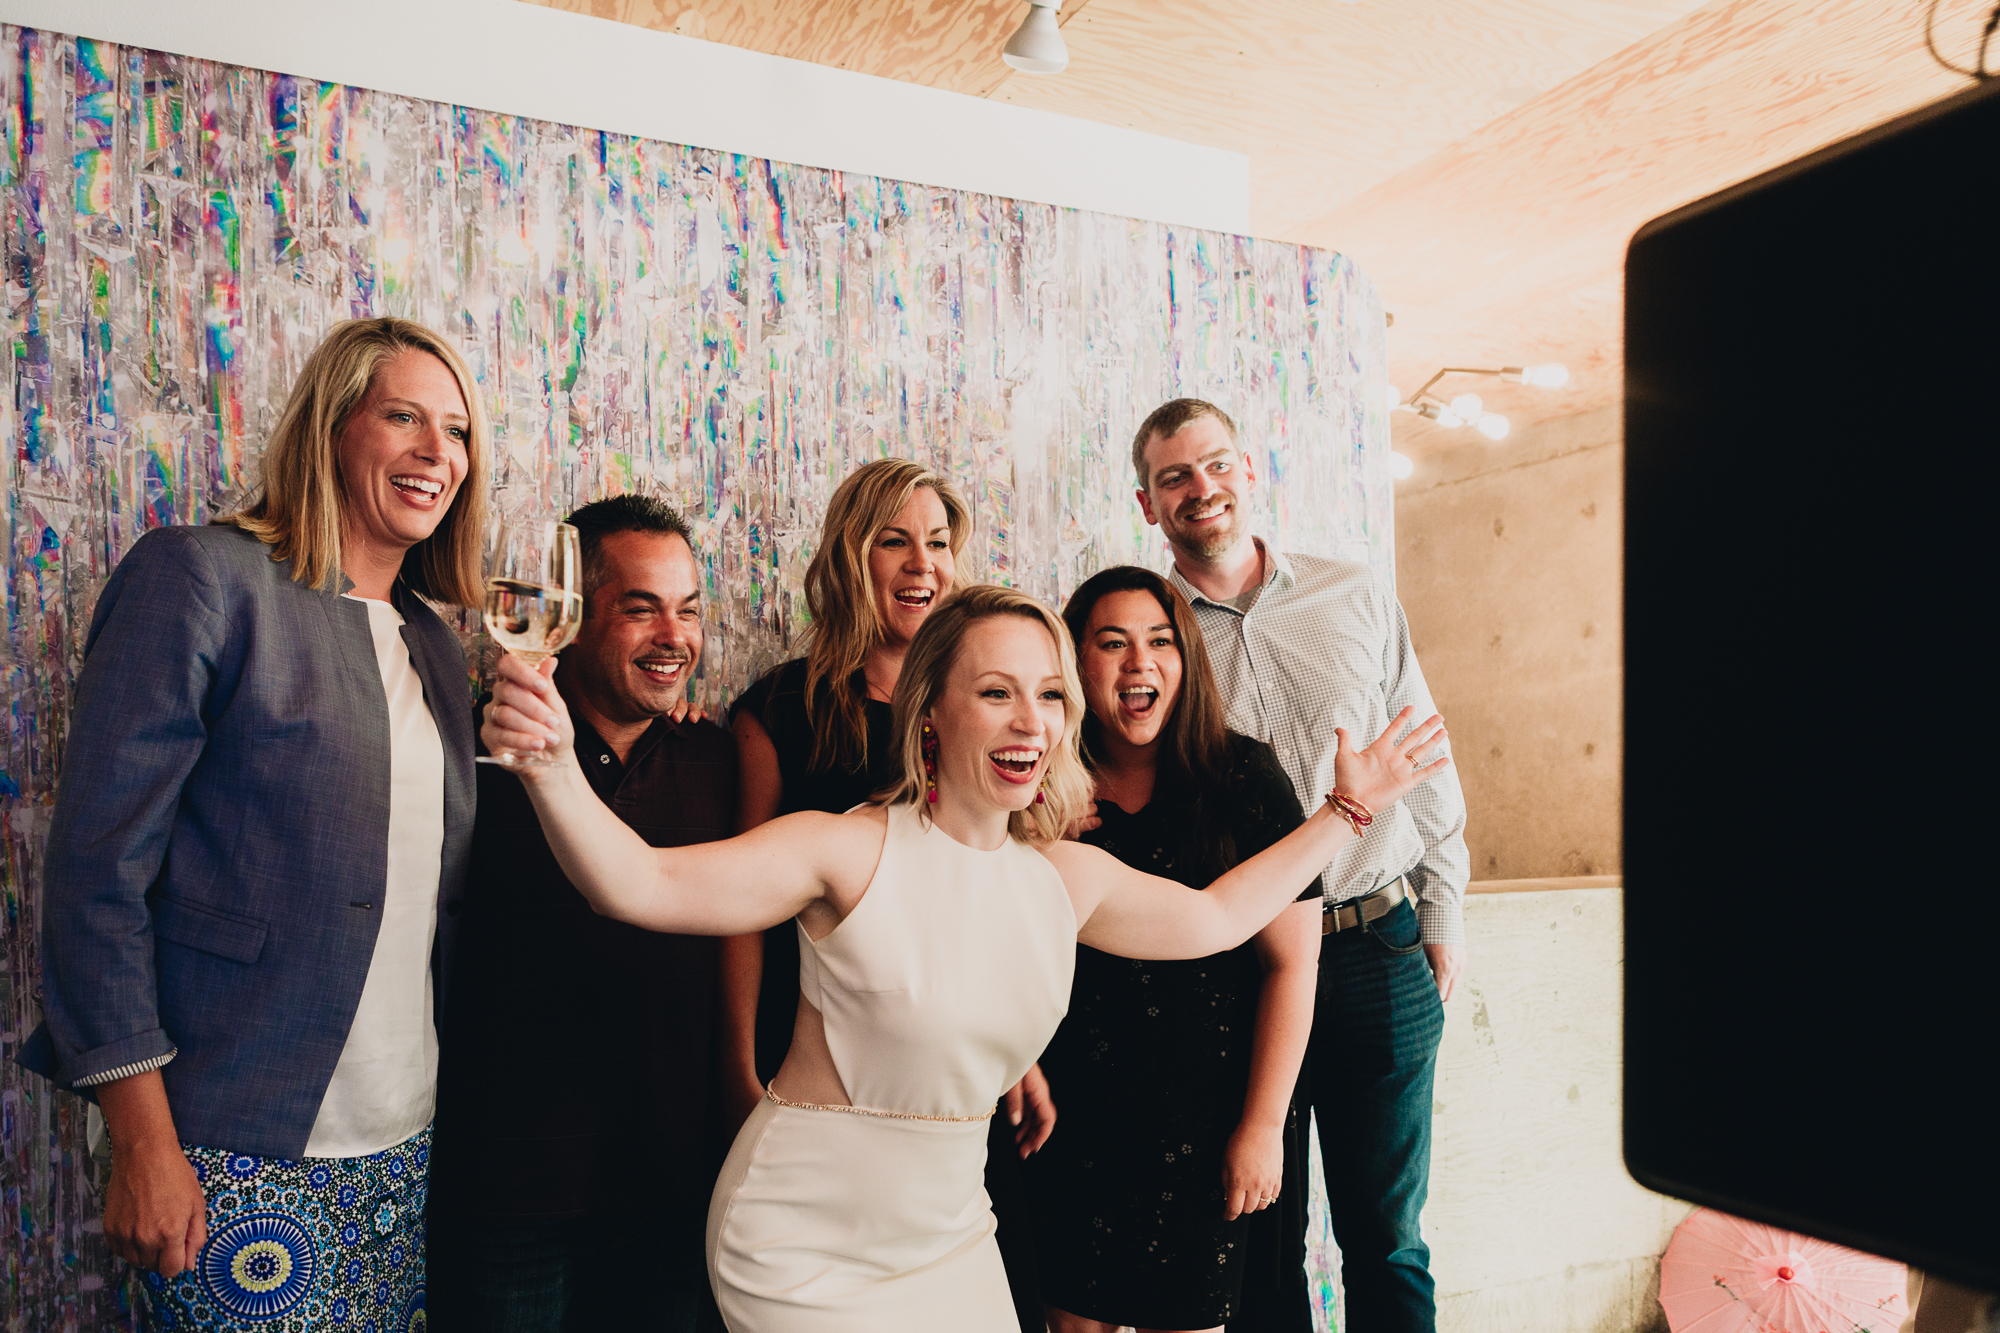 canvas event space wedding photos by Krista Welch-0111.jpg